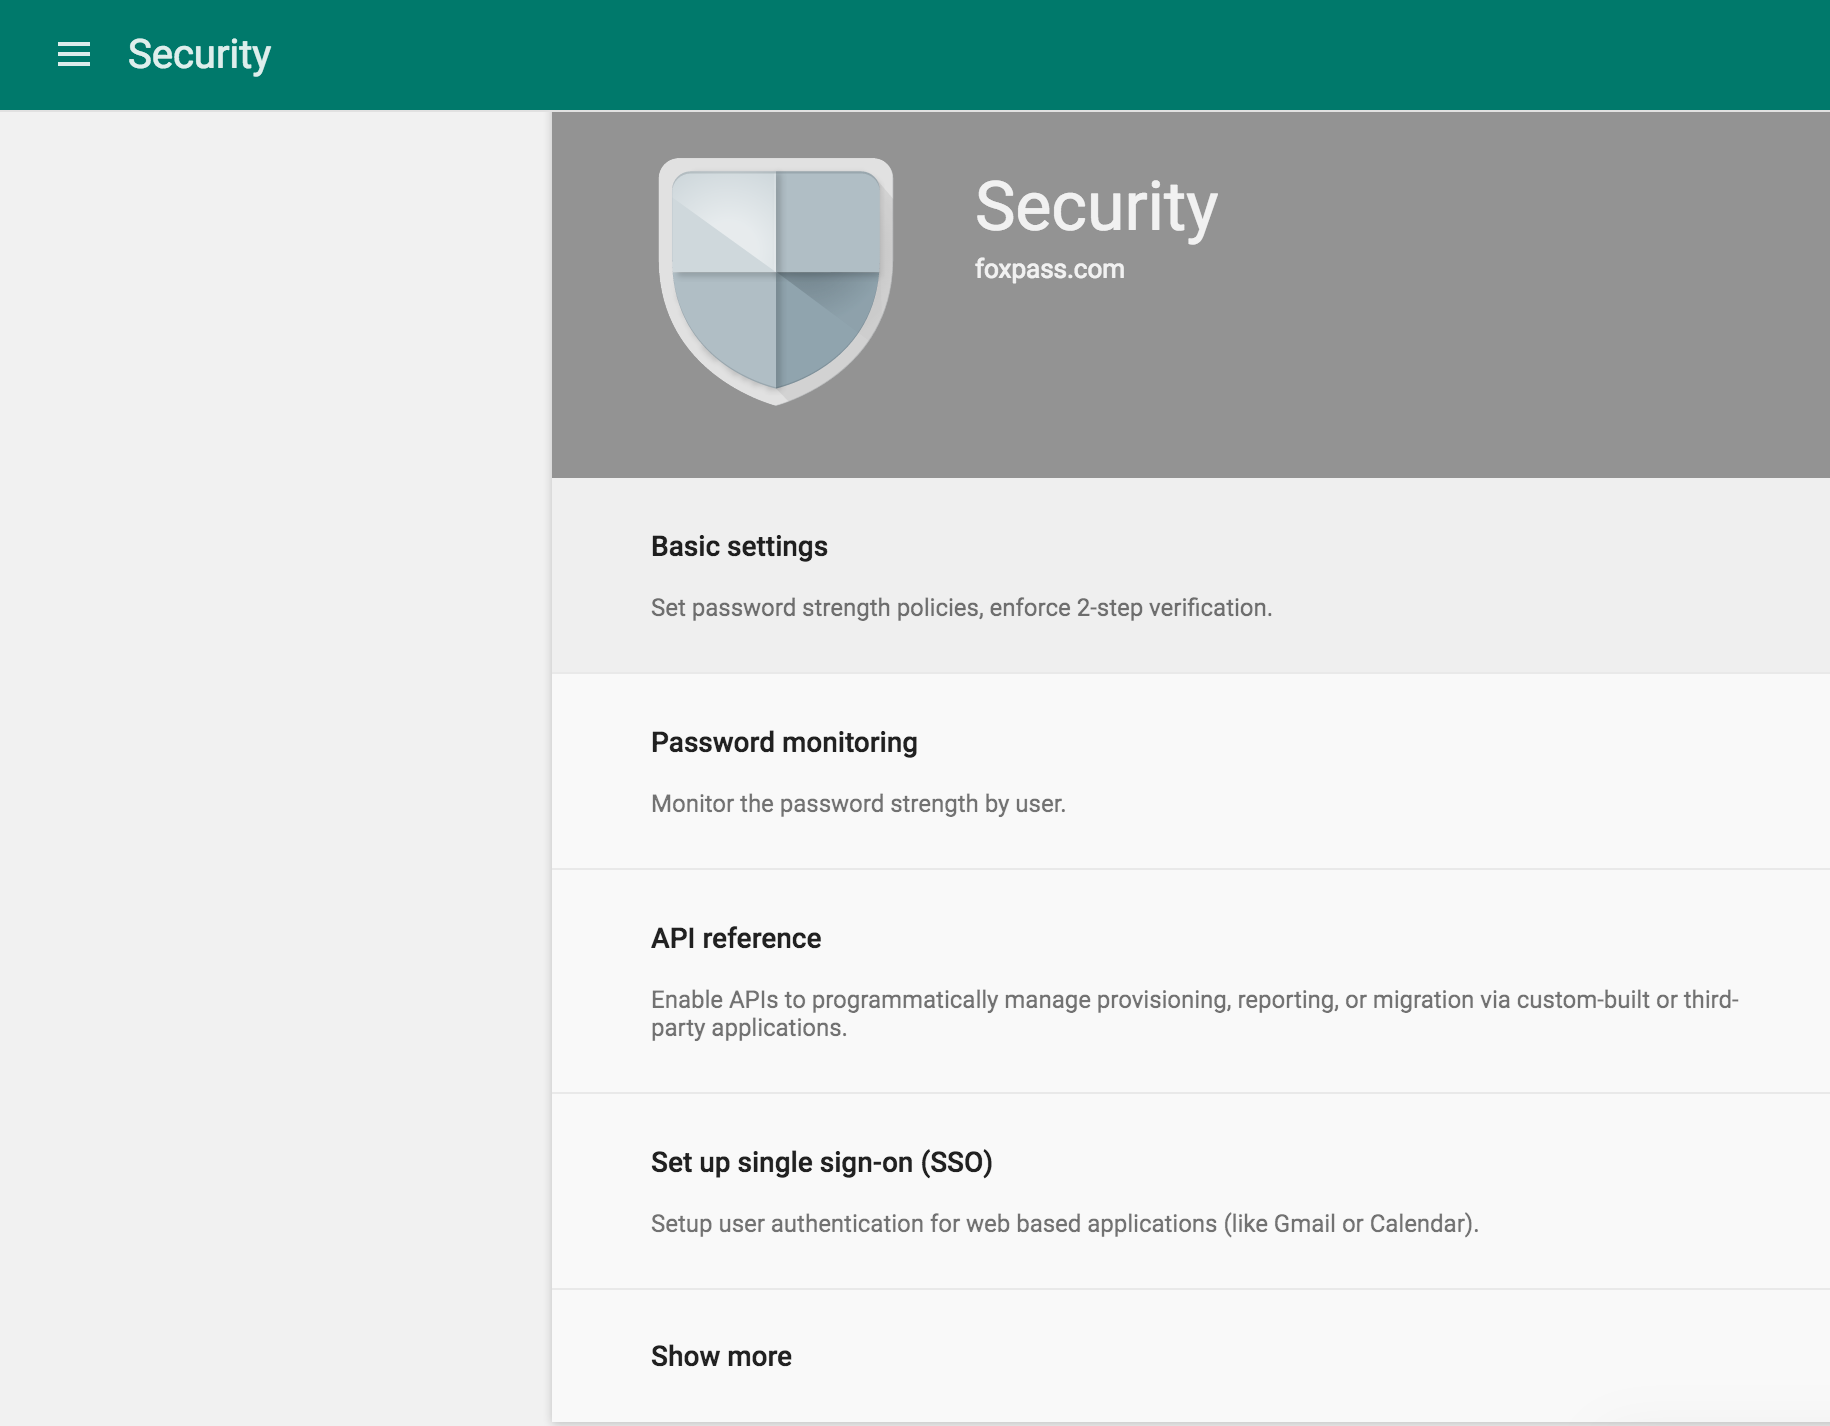 Enabling Less Secure Google Apps